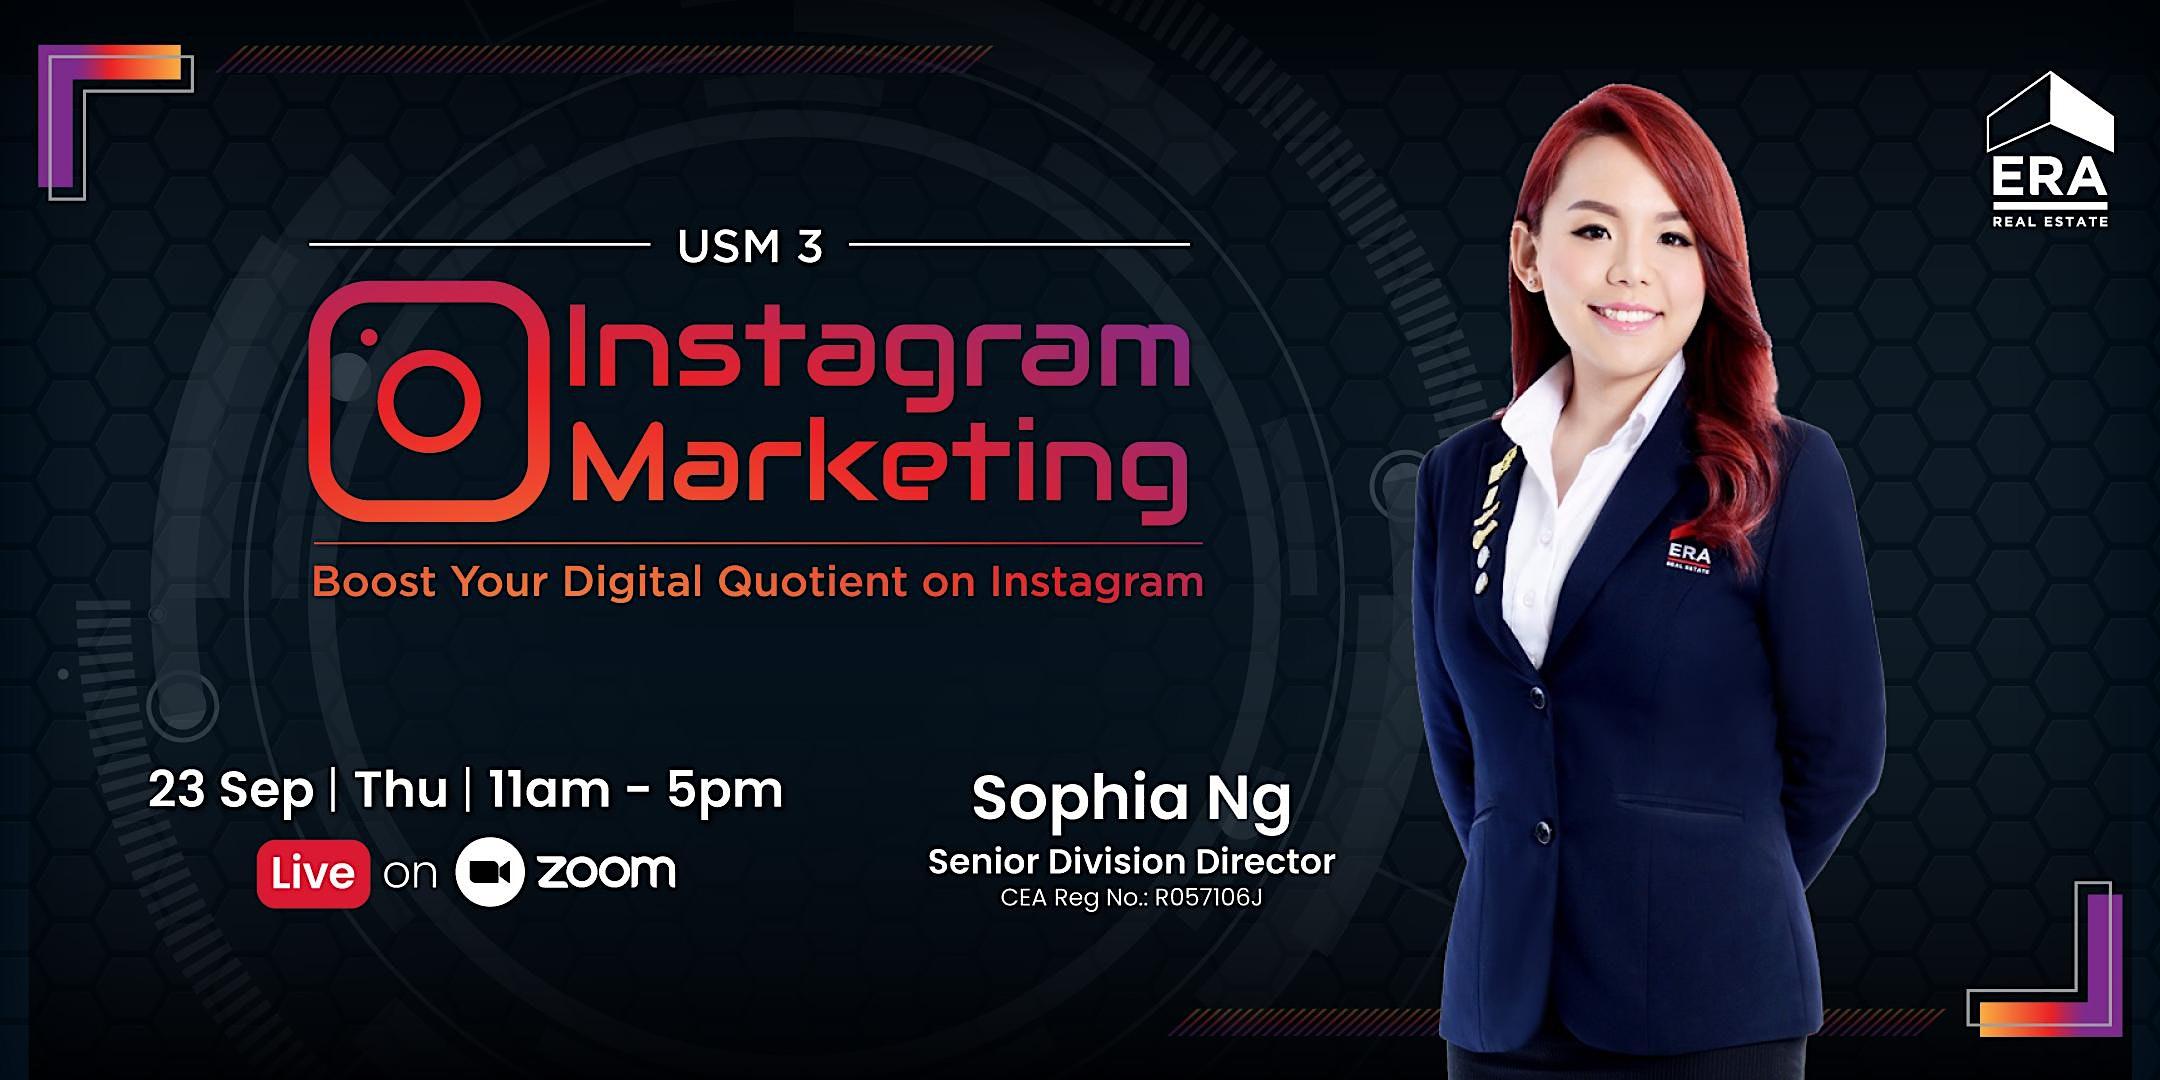 USM 3 : Instagram Marketing